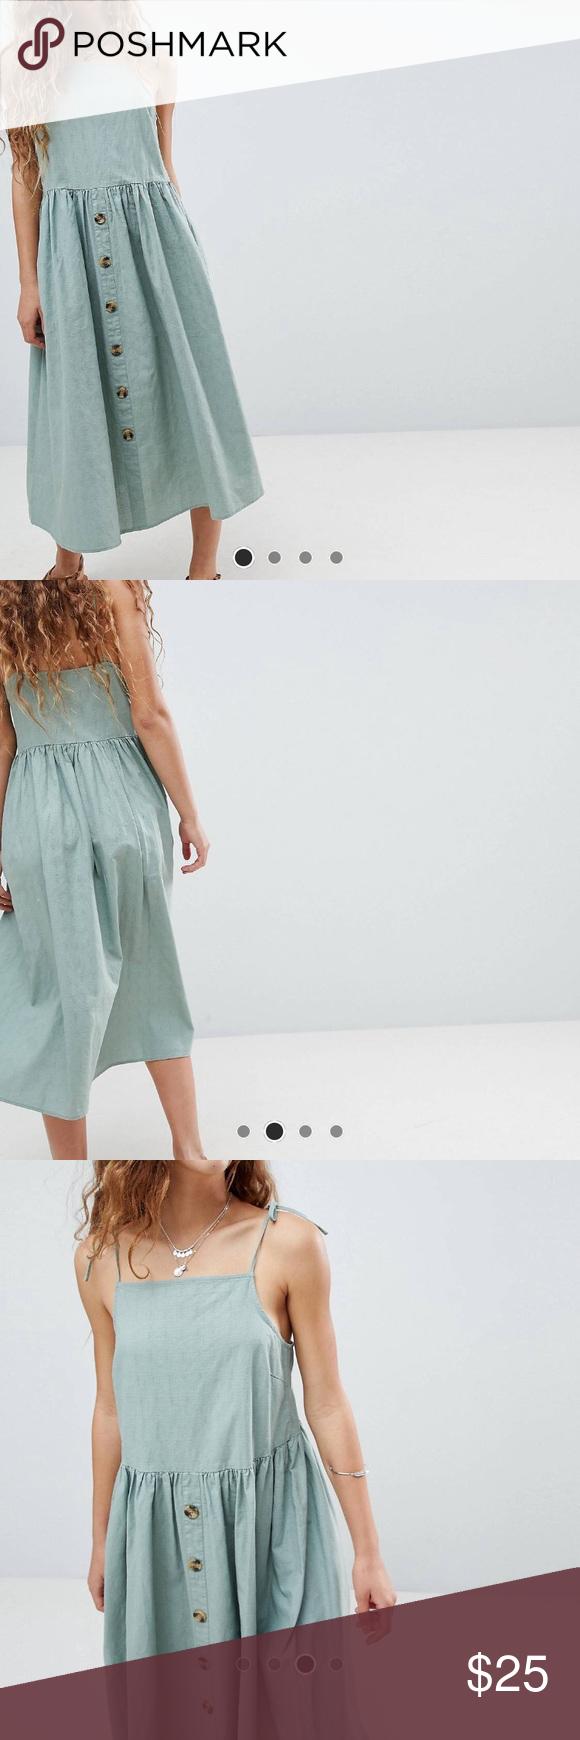 Urban Outfitters Button Down Tank Top Midi Dress Tank Top Midi Dress Urban Dresses Urban Outfitters Dress [ 1740 x 580 Pixel ]